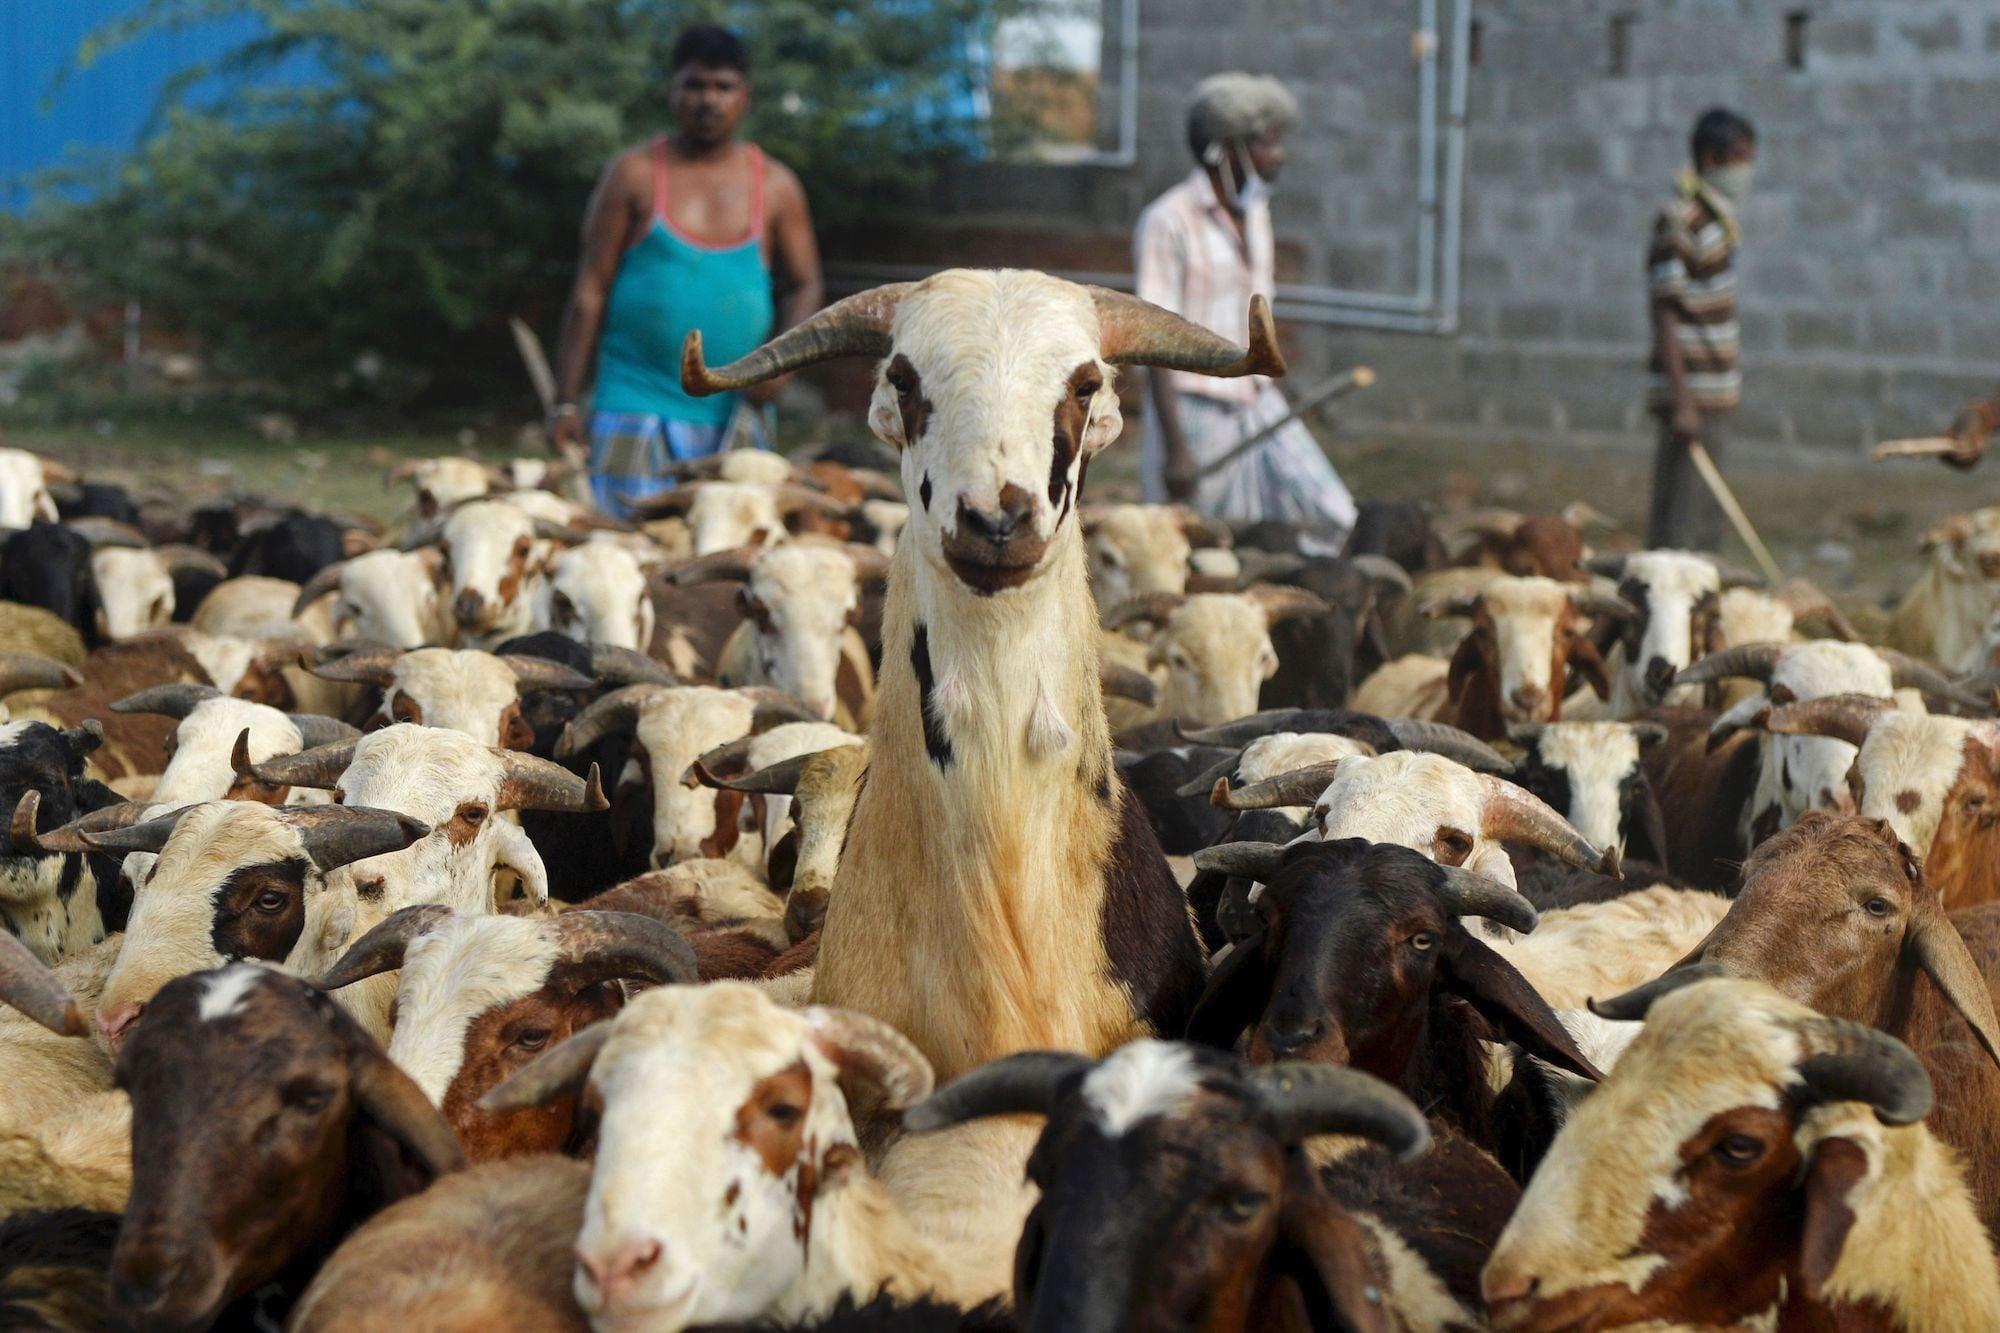 Virus fears force animal sellers online for Eidul Azha